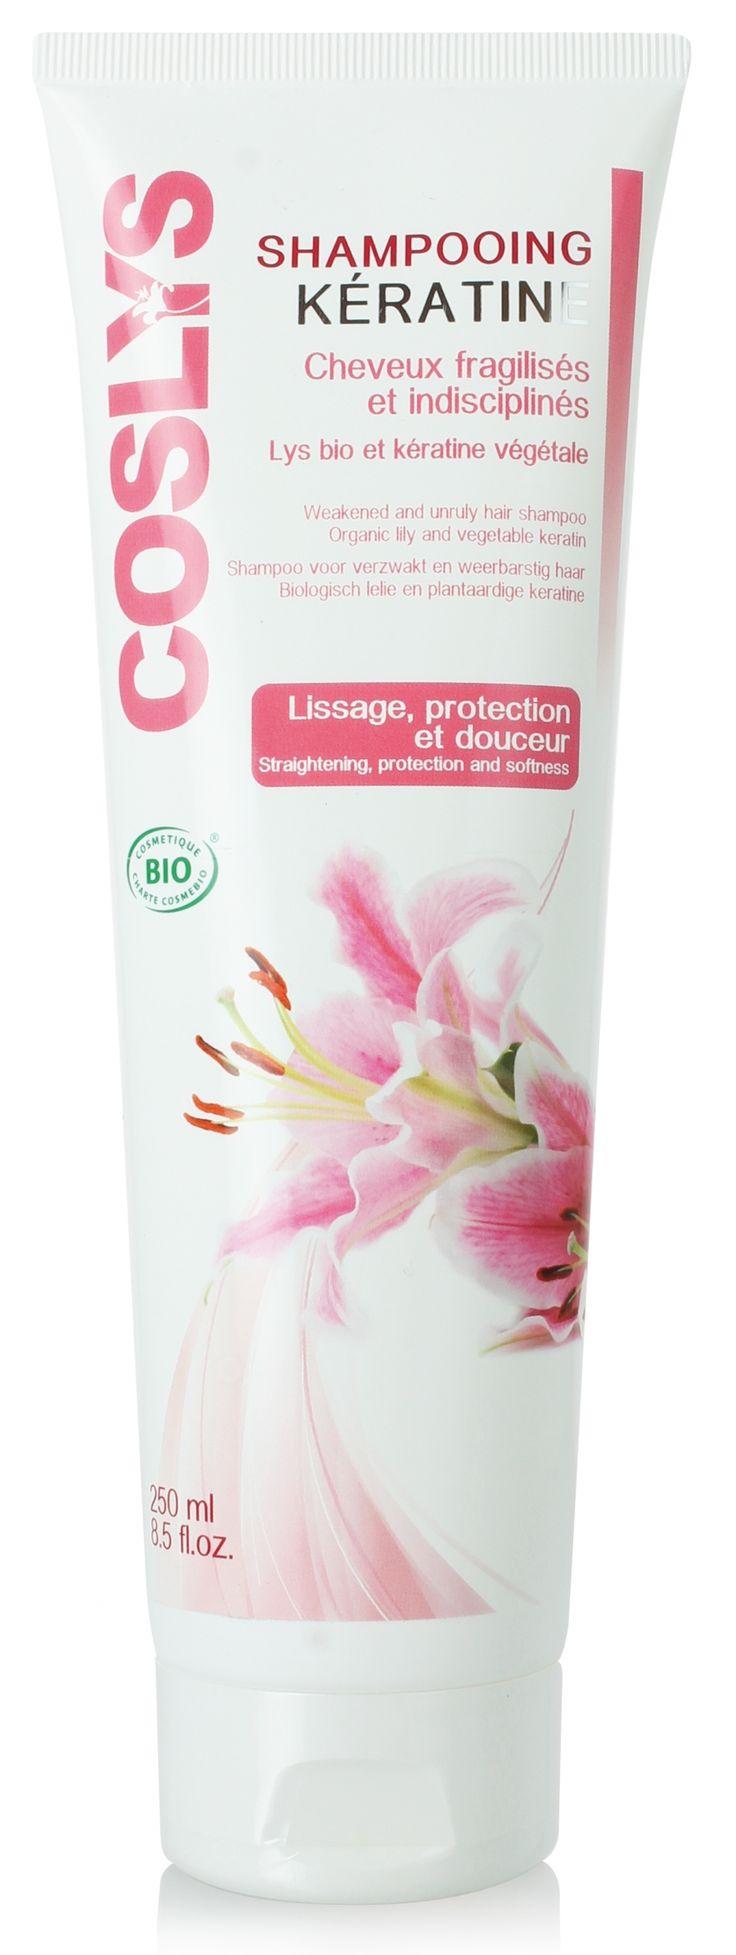 Doux Good - Coslys - Shampoing keratine